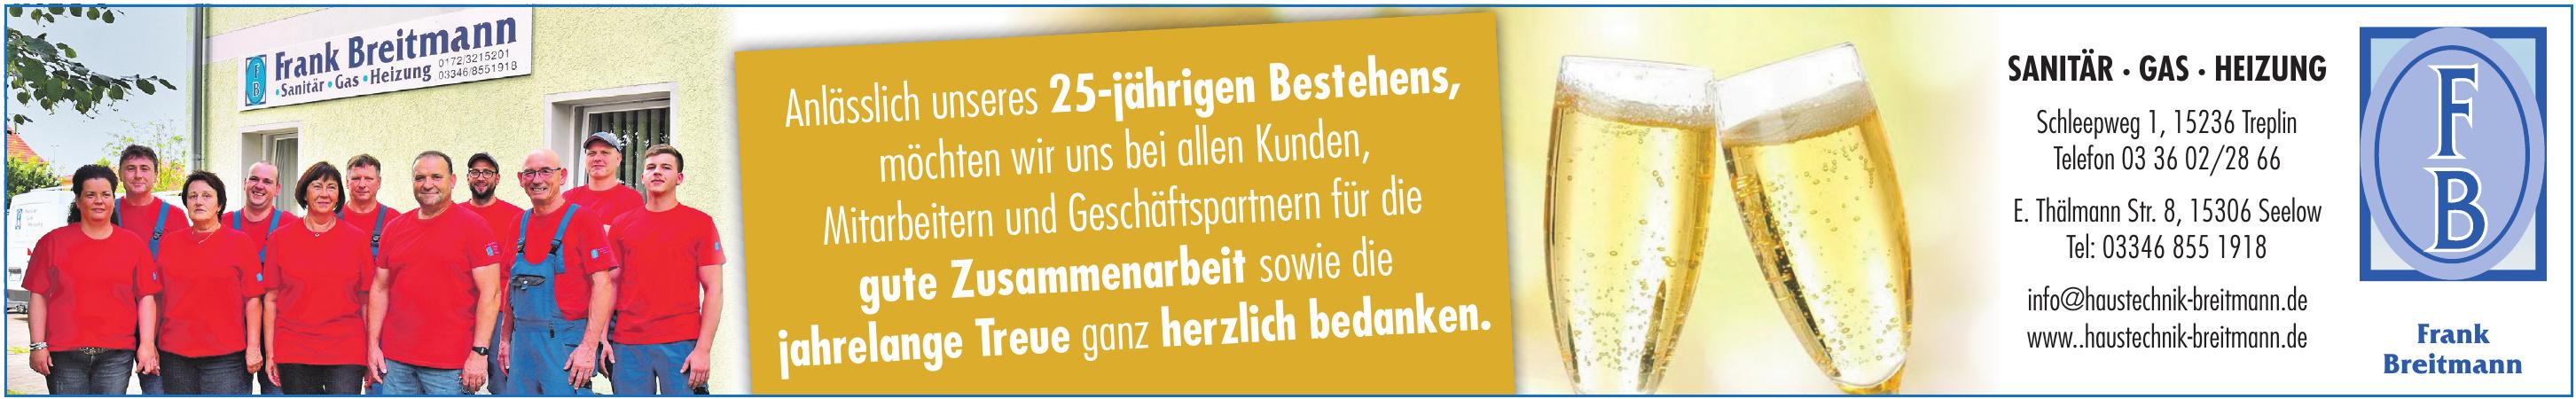 FB Frank Breitmann